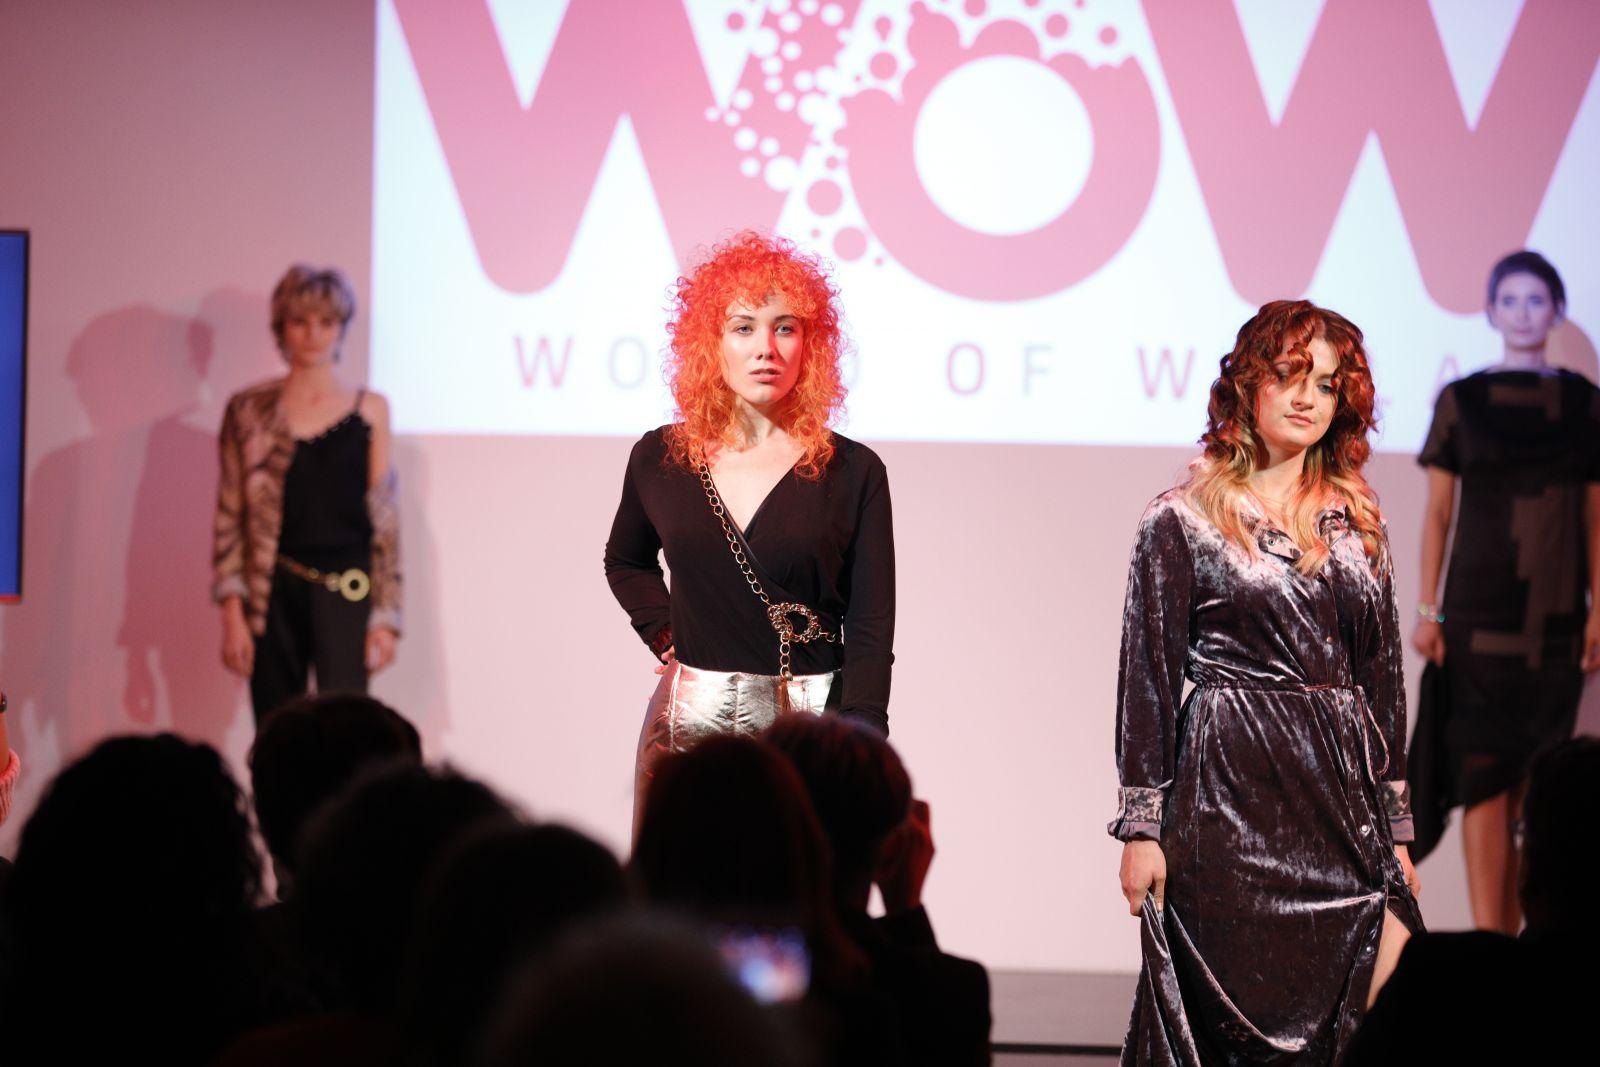 WOW, World Of Wella, Wella Professionals, Wella Studio Budapest, Wella oktatások, Wella, online időpontfoglaló program_bwnet, fodrászok